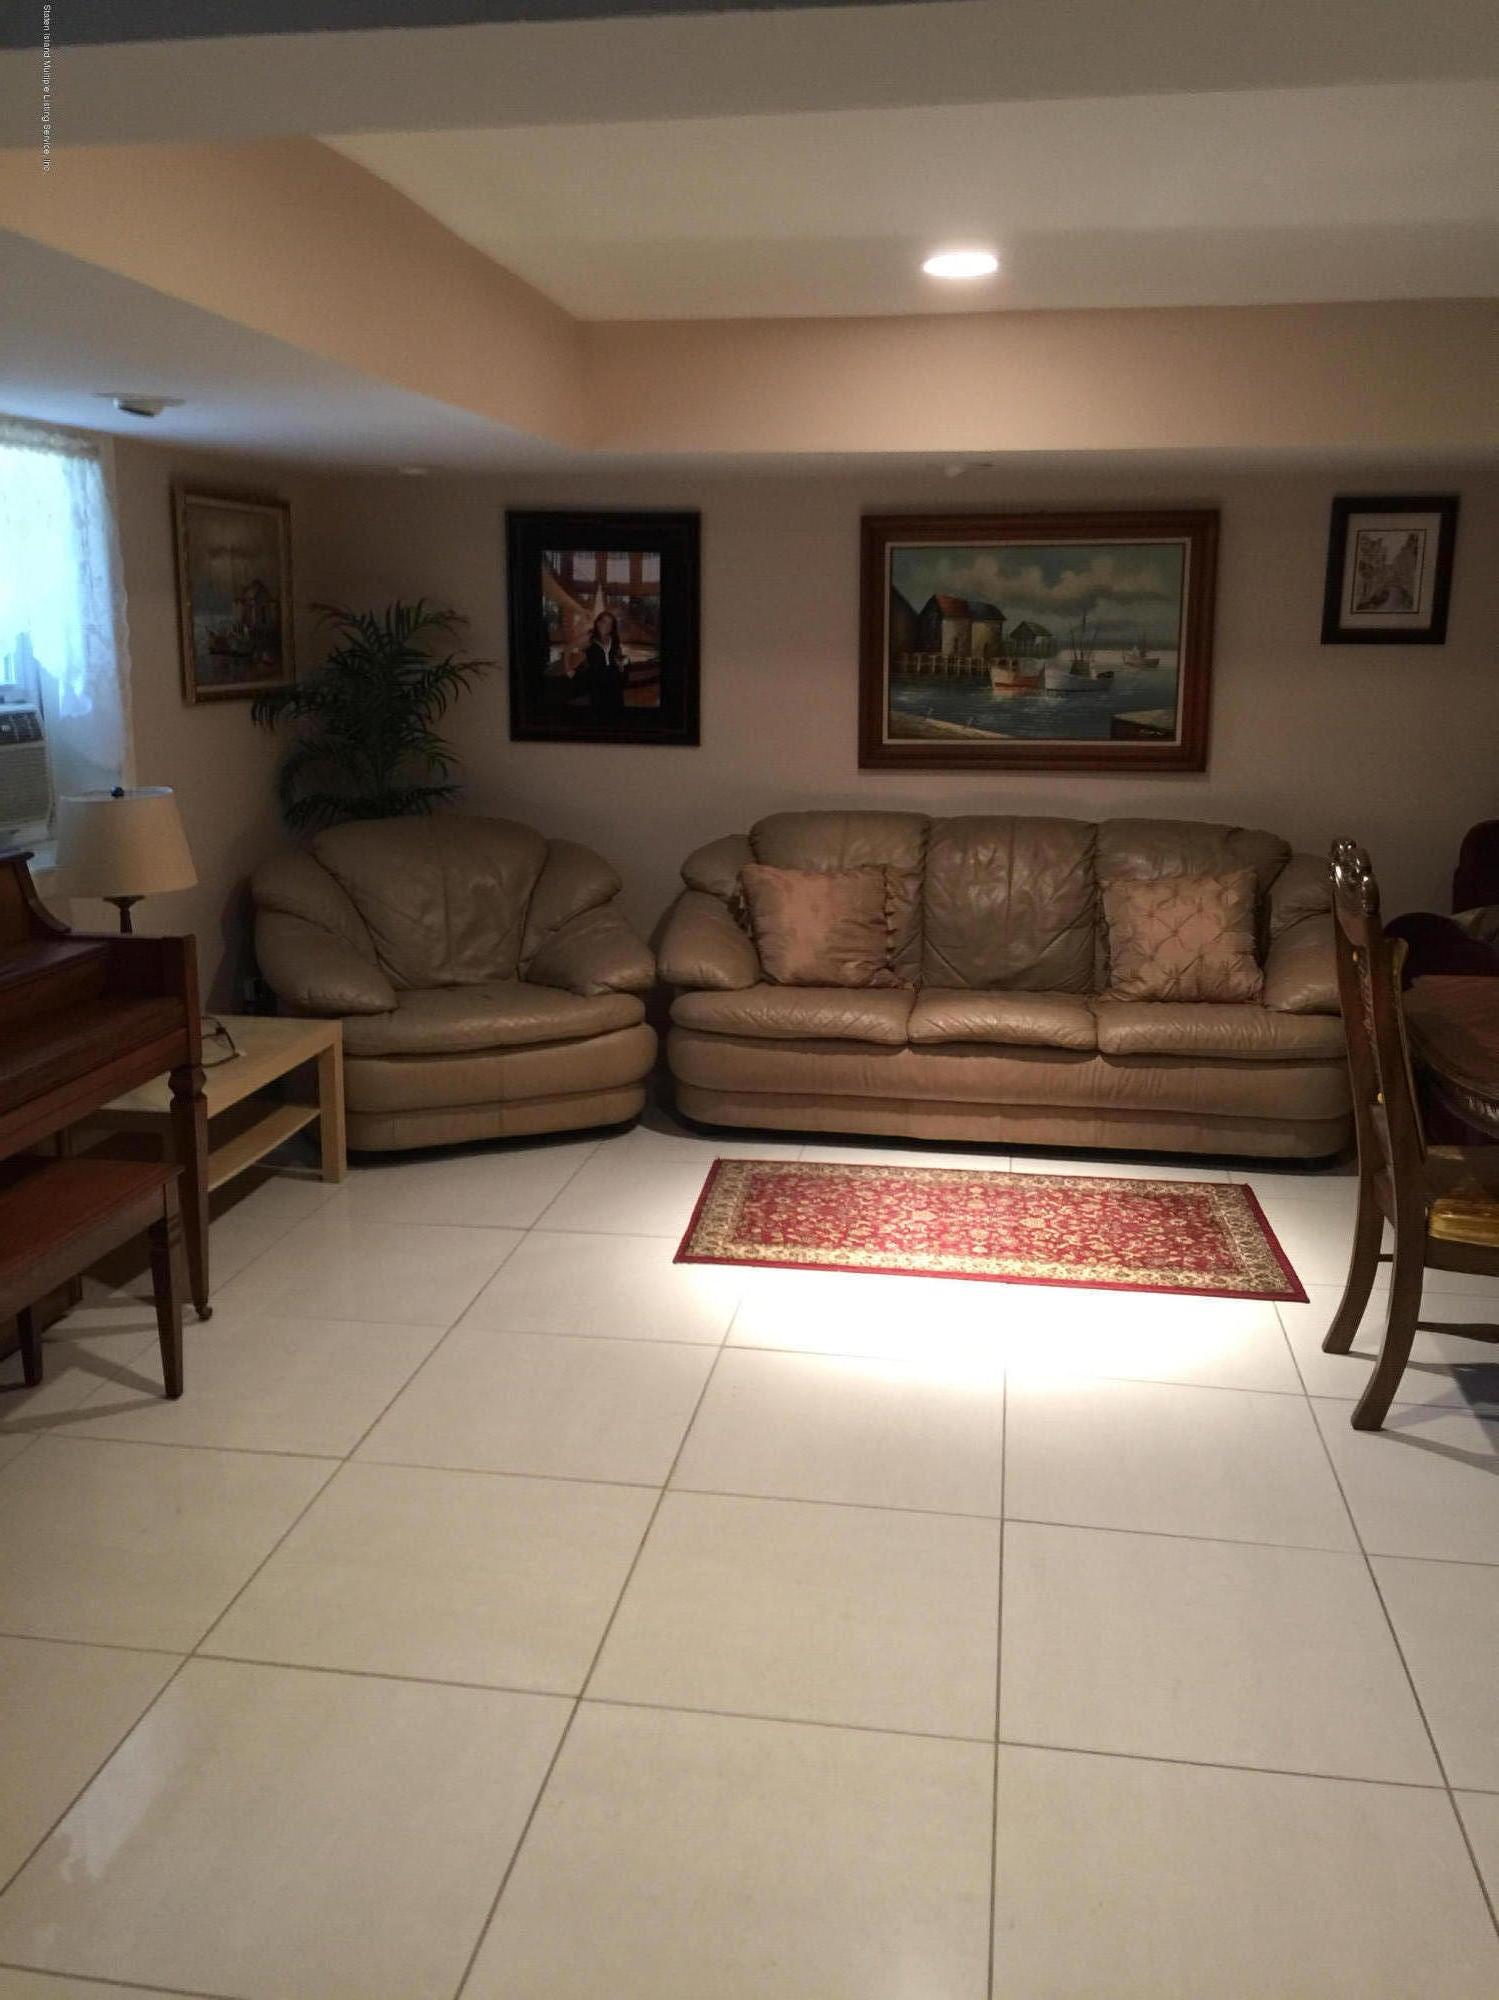 Single Family - Detached 108 Clarke Avenue  Staten Island, NY 10306, MLS-1106455-43